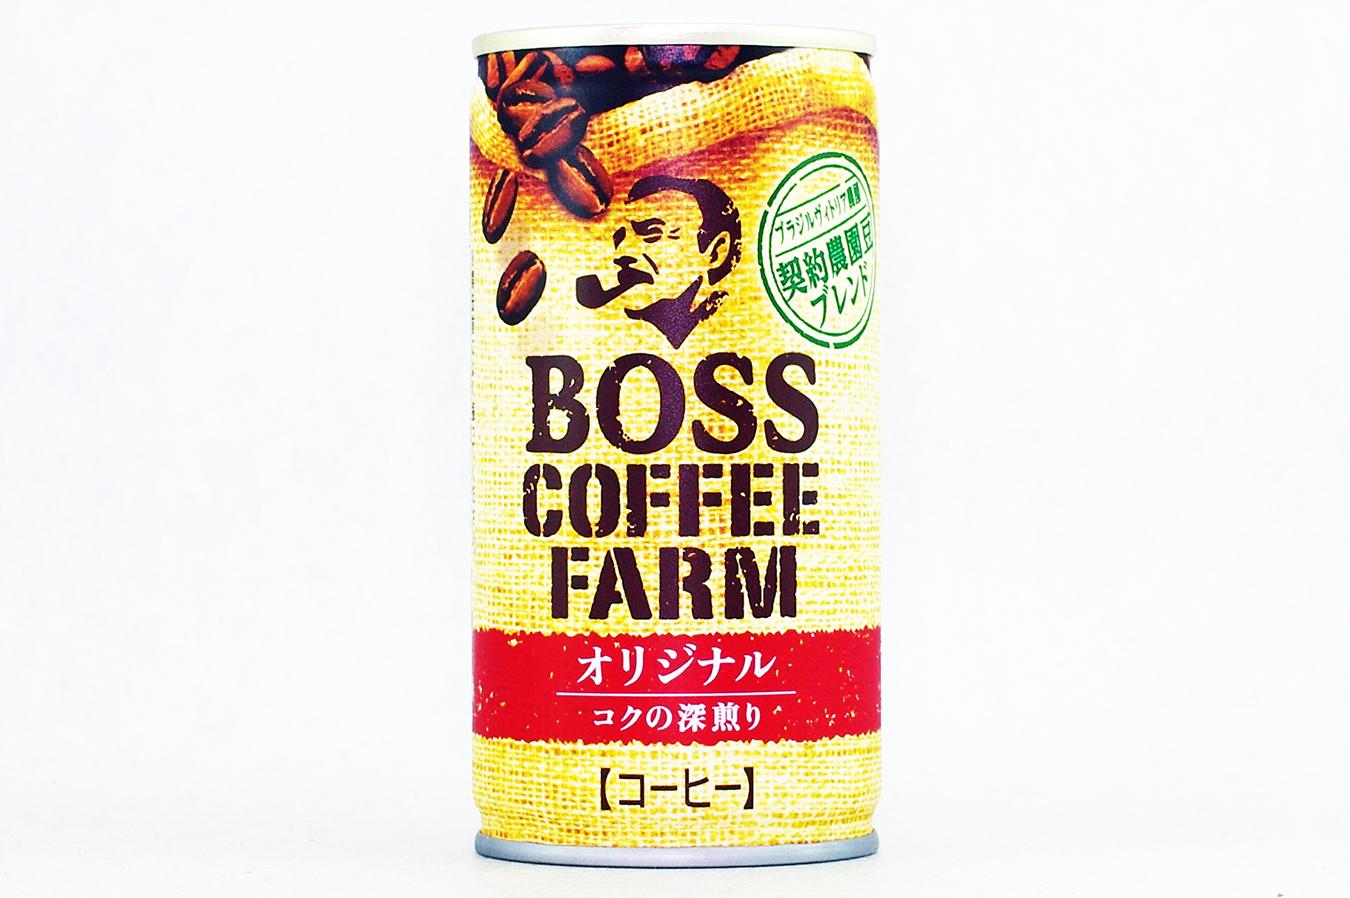 BOSS COFFEE FARM オリジナルブレンド 2018年10月